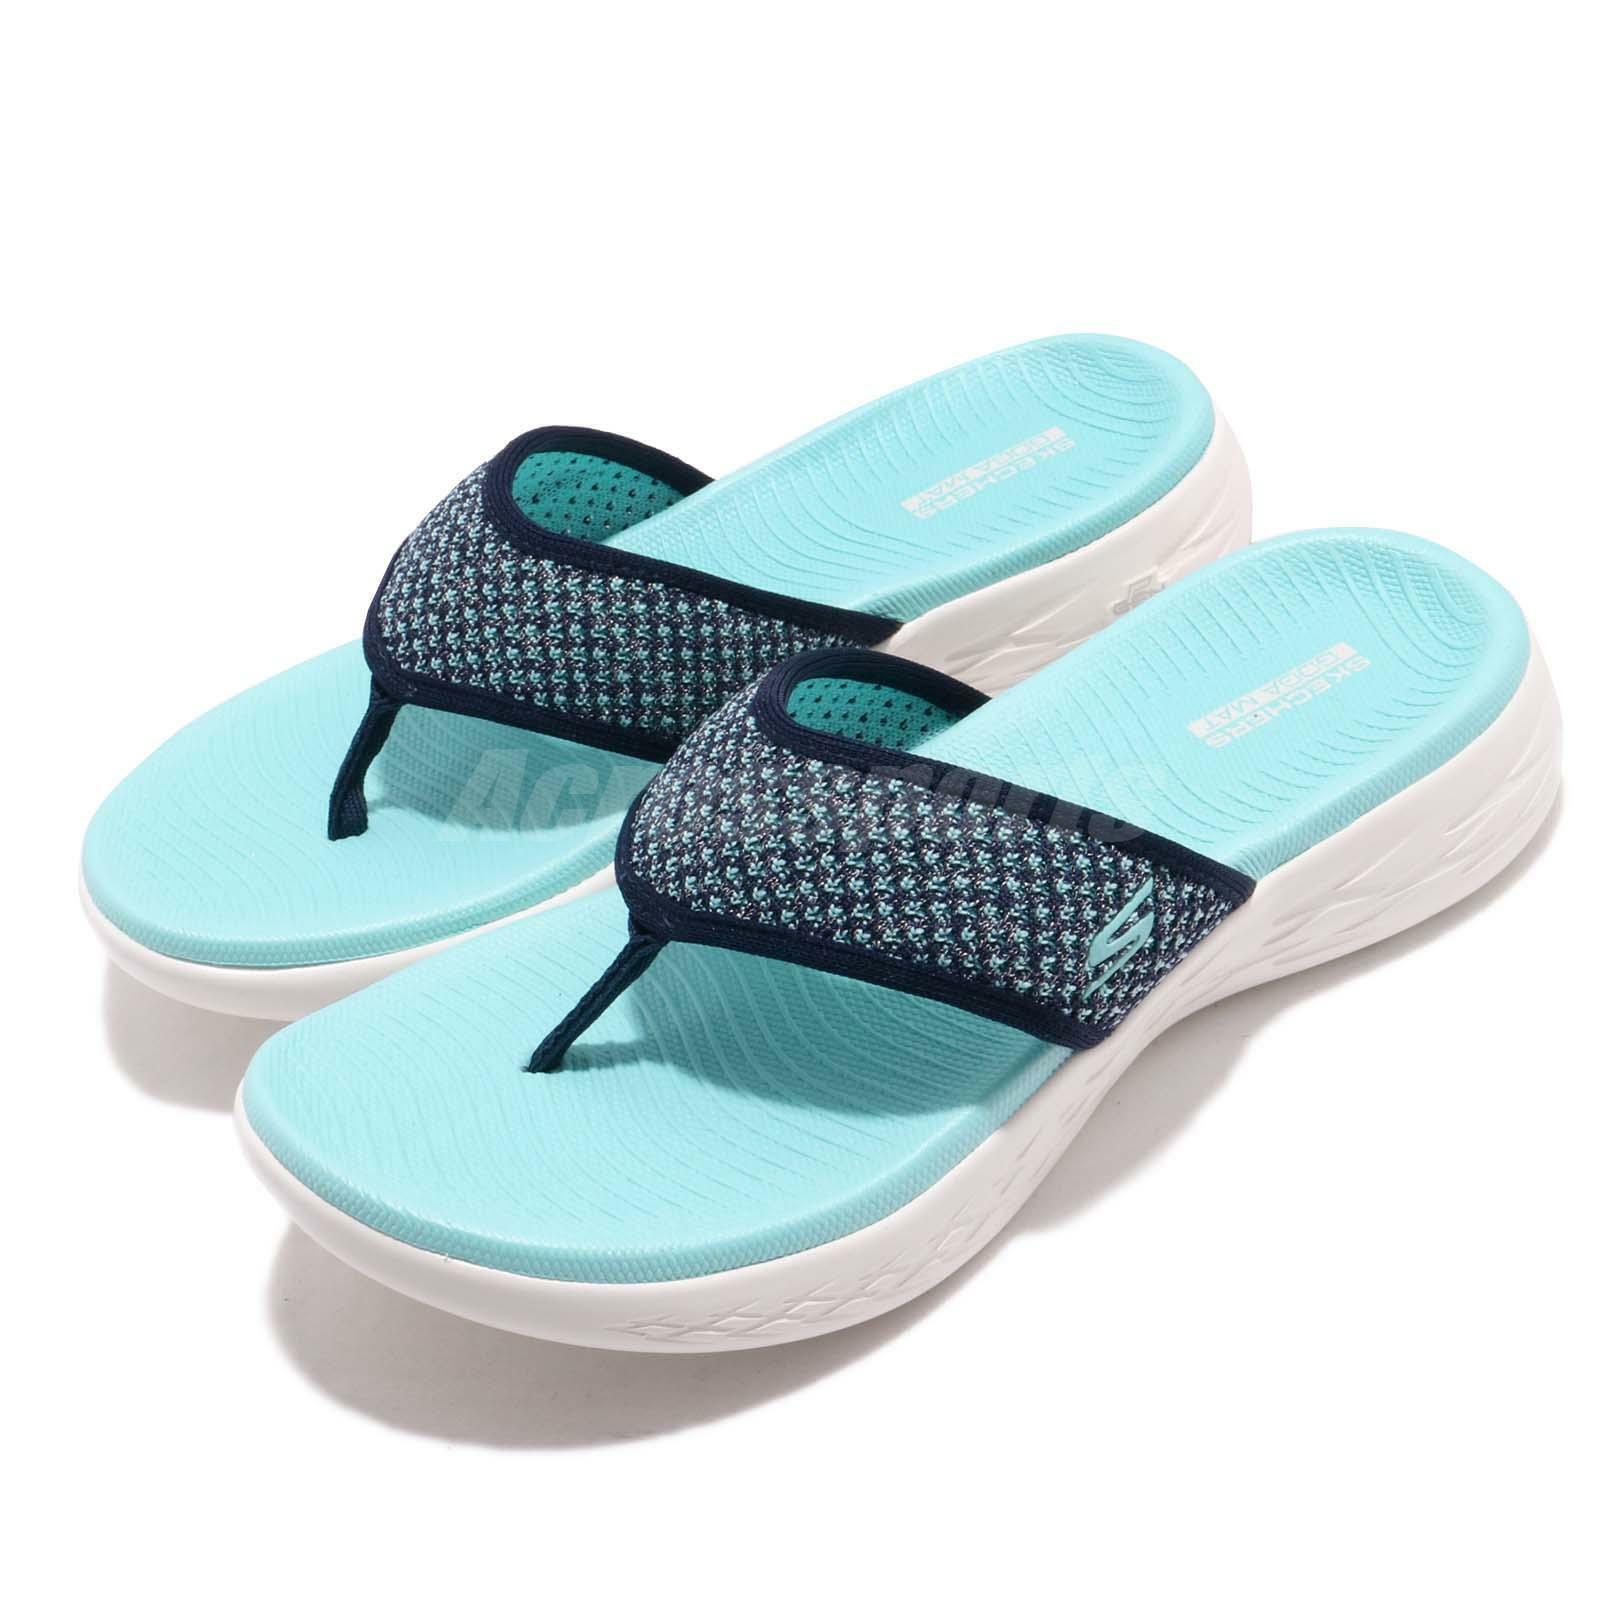 Skechers On The Go 600-Glossy Navy Aqua blanc femmes Flip-Flops Sandal 16150-NVAQ